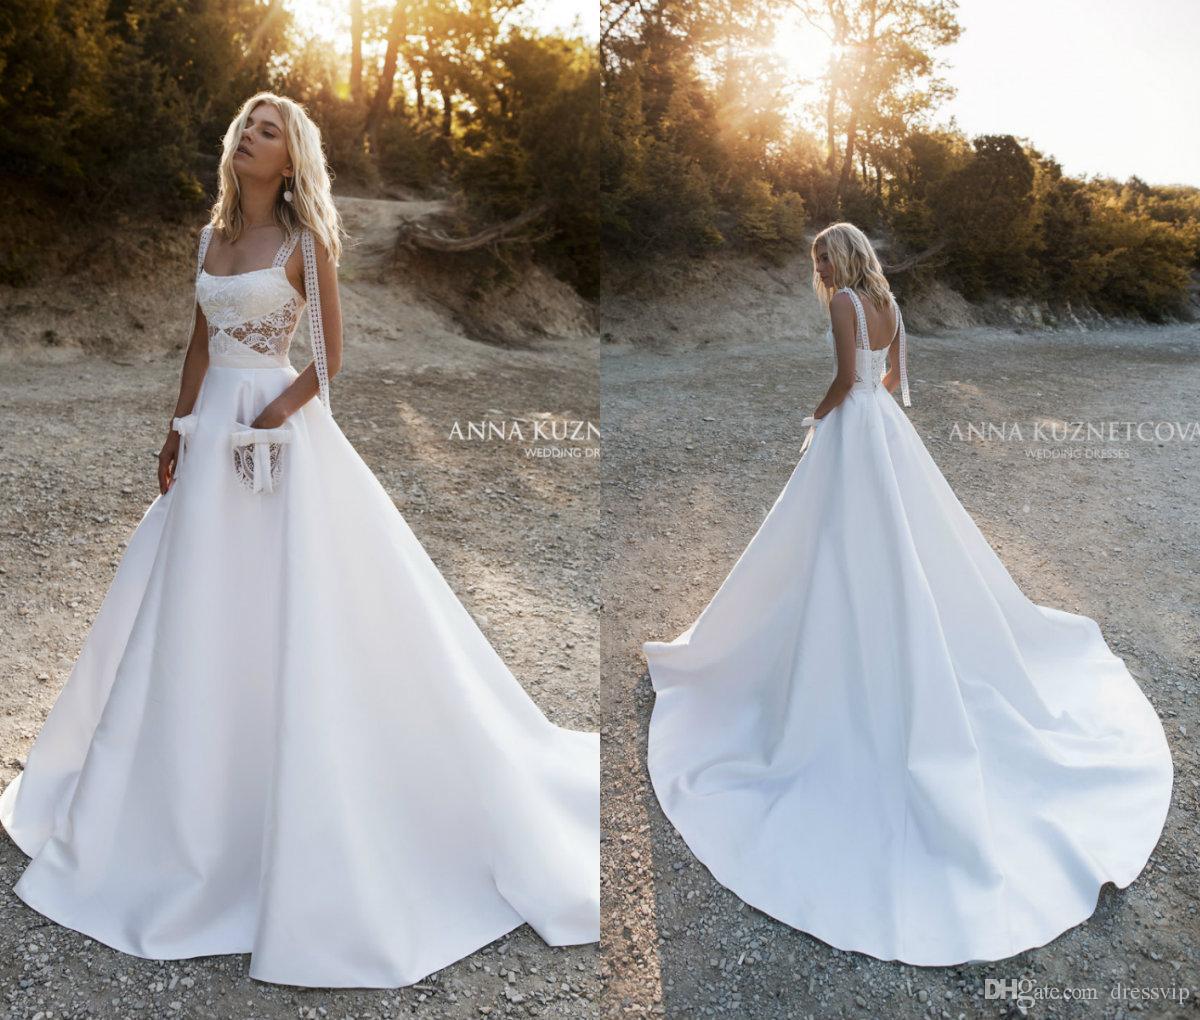 2019 Beach Wedding Dresses With Pocket Straps A Line Satin Sweep Train Lace Boho Wedding Dress Custom Plus Size Elegant Bridal Gowns